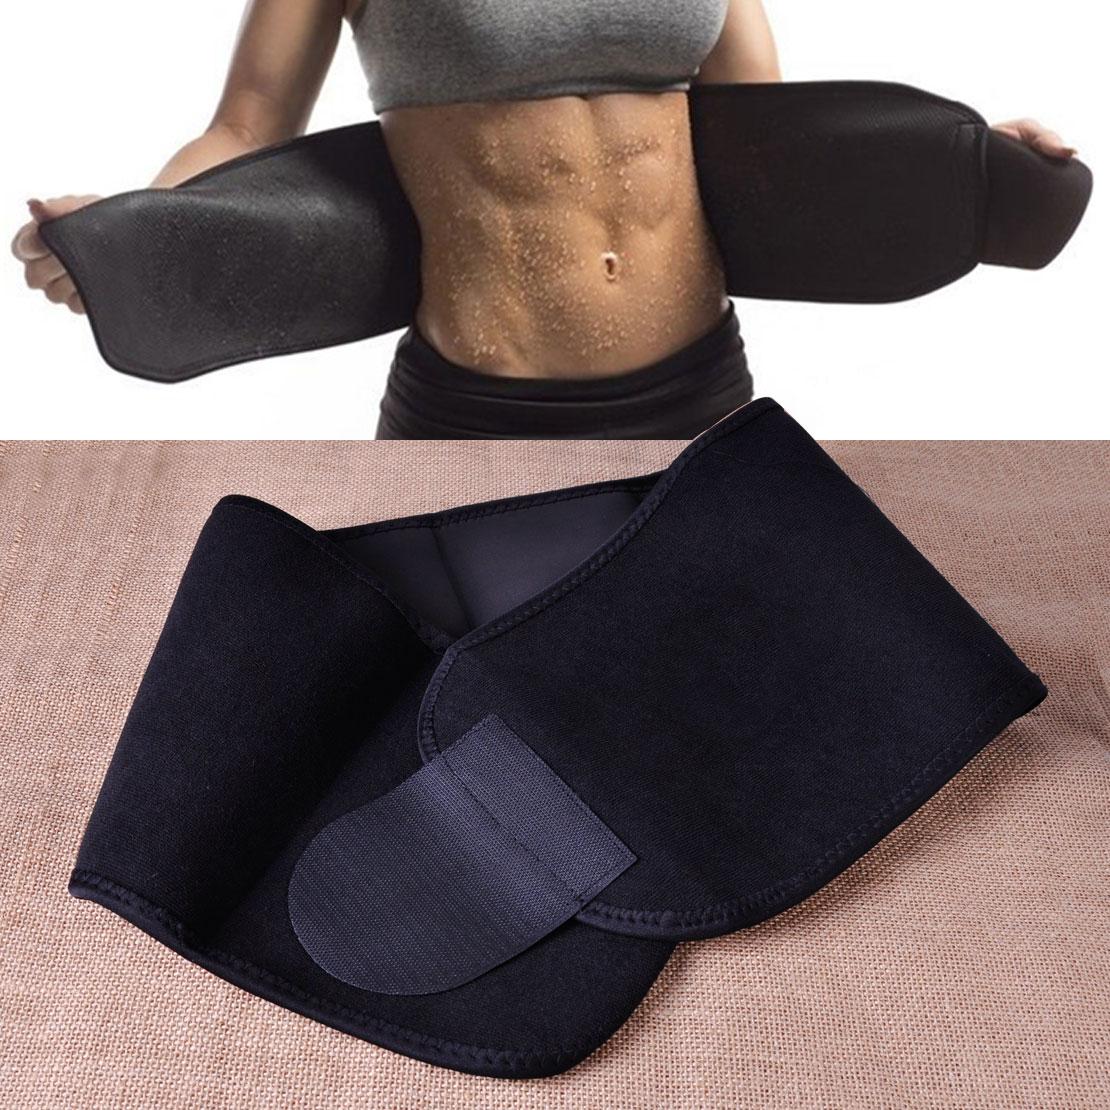 Neoprene Black Waist Tummy Trimmer Slimming Belt Sweat Band Body Shaper Wrap font b Weight b